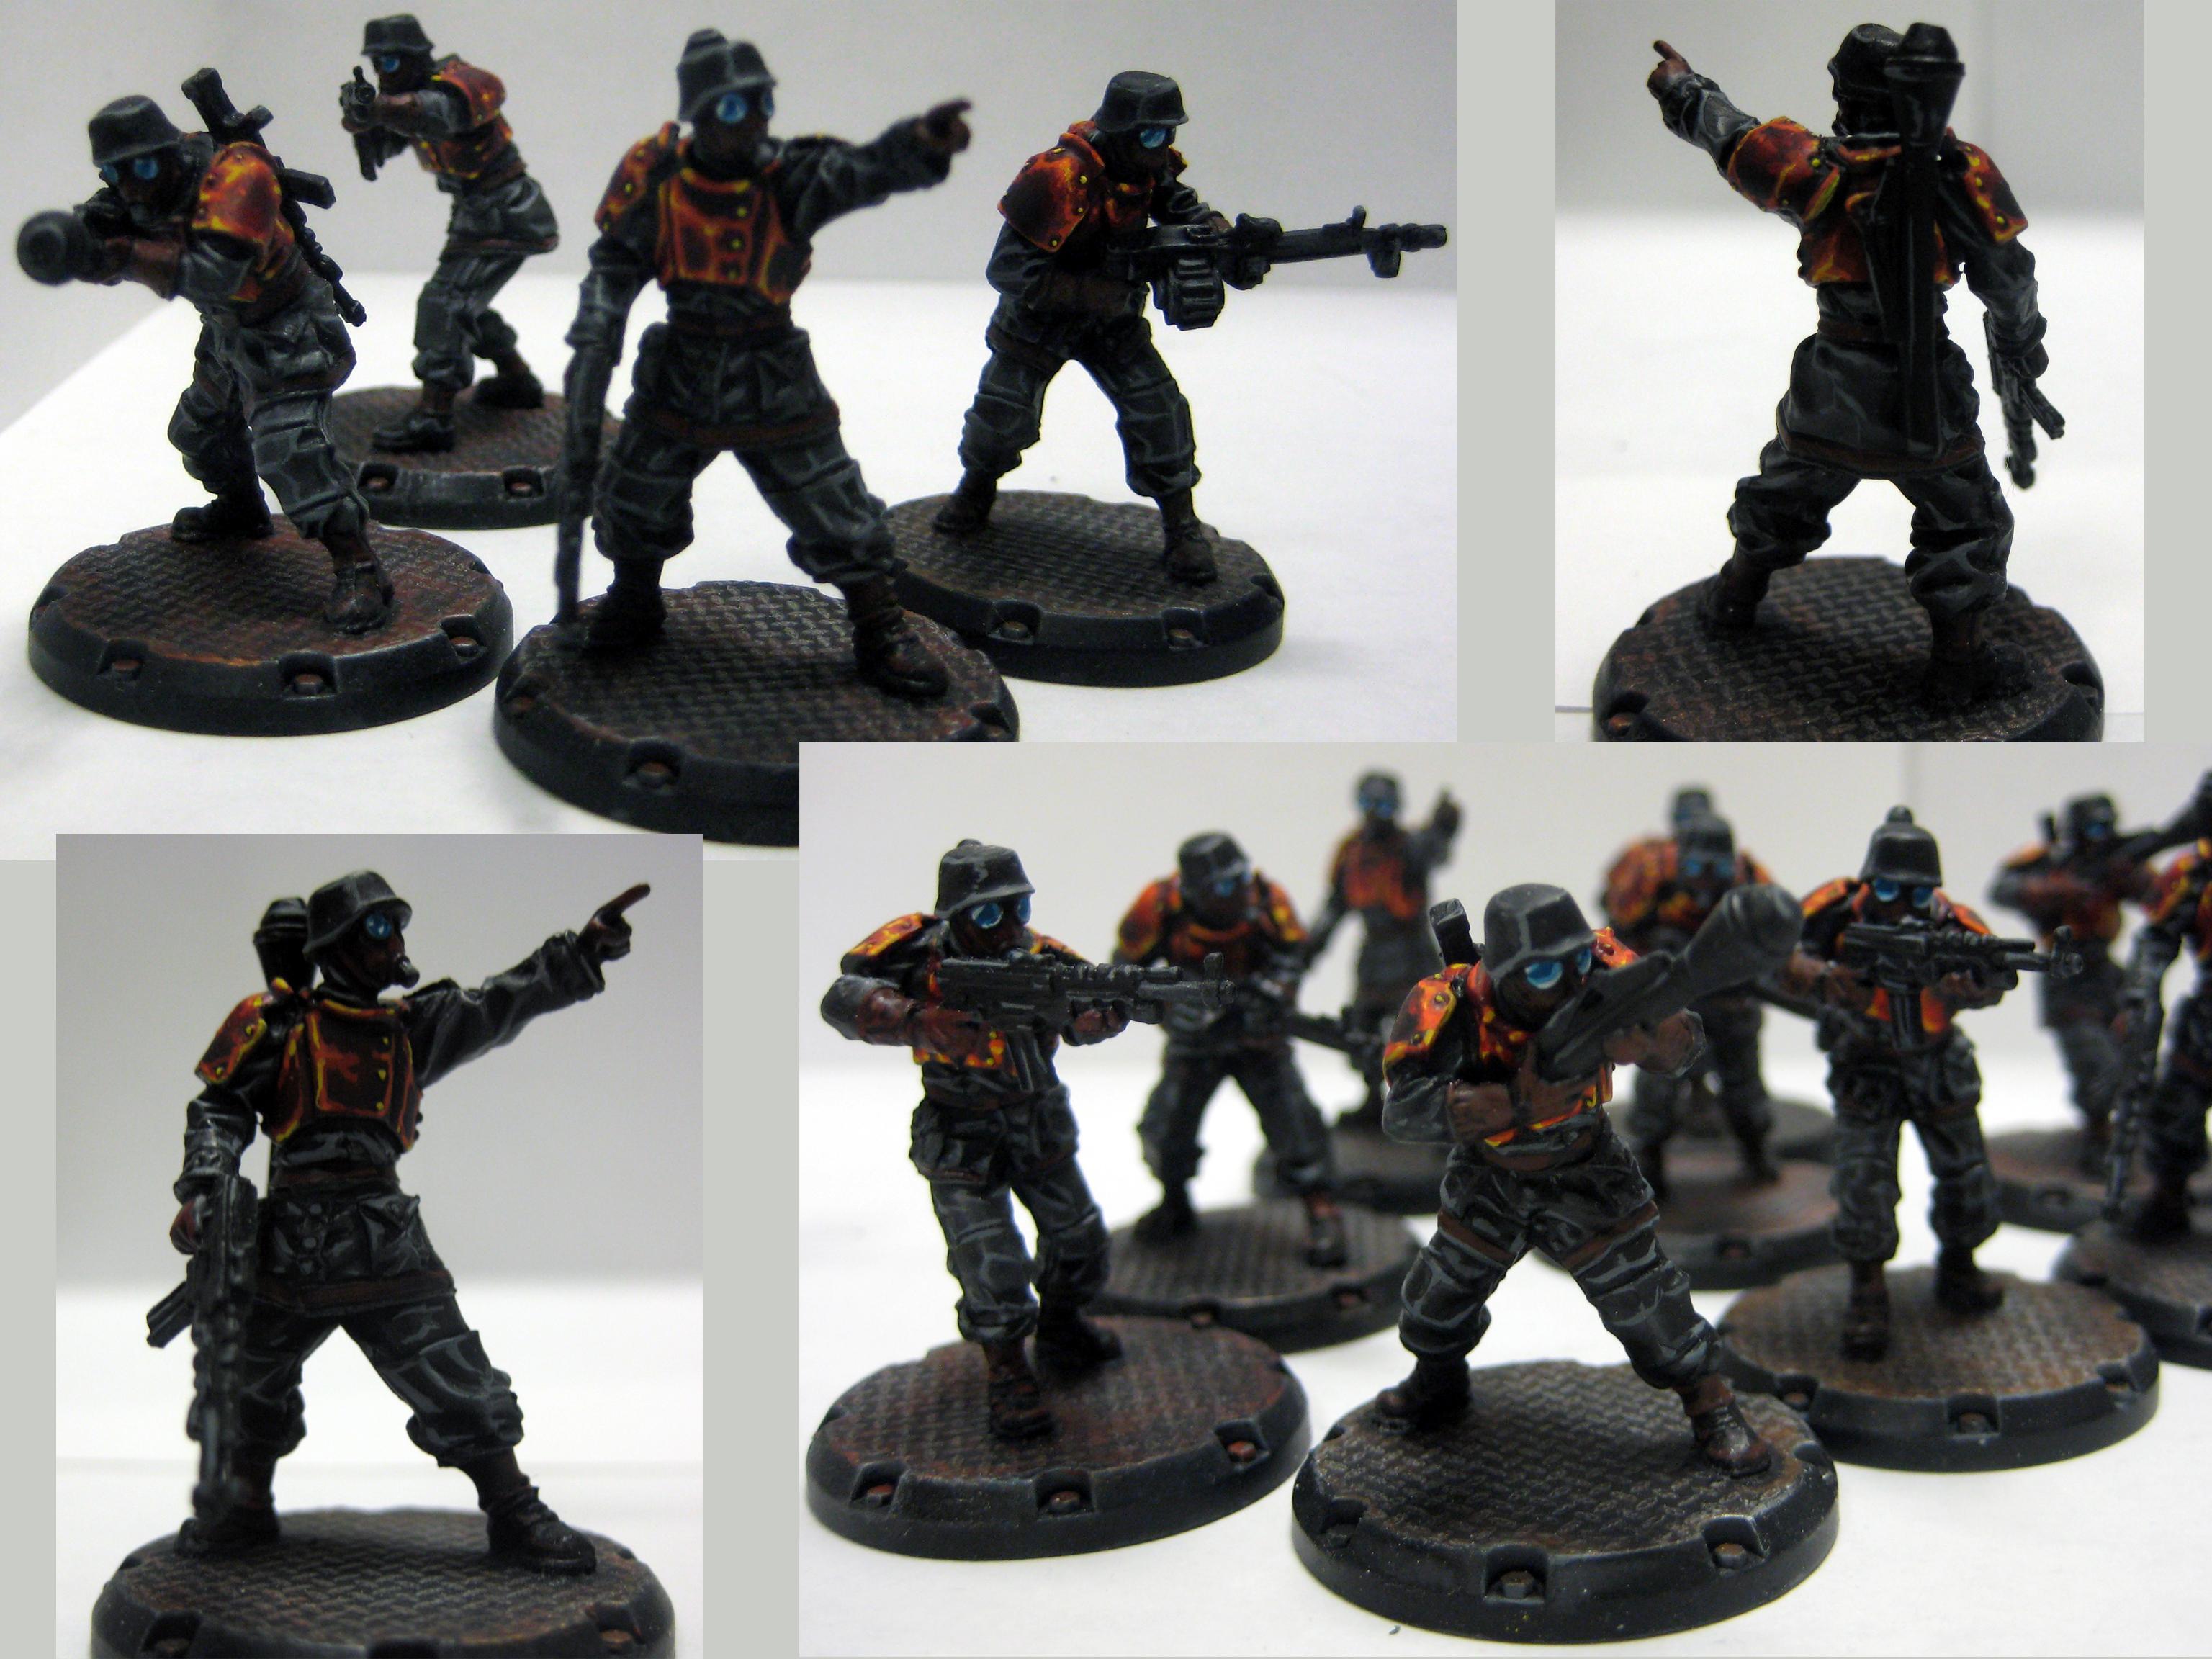 Baneblade, Dust Tactics, Grenadiers, Lava, Red, Sentinel, Traitor Guard, Walker